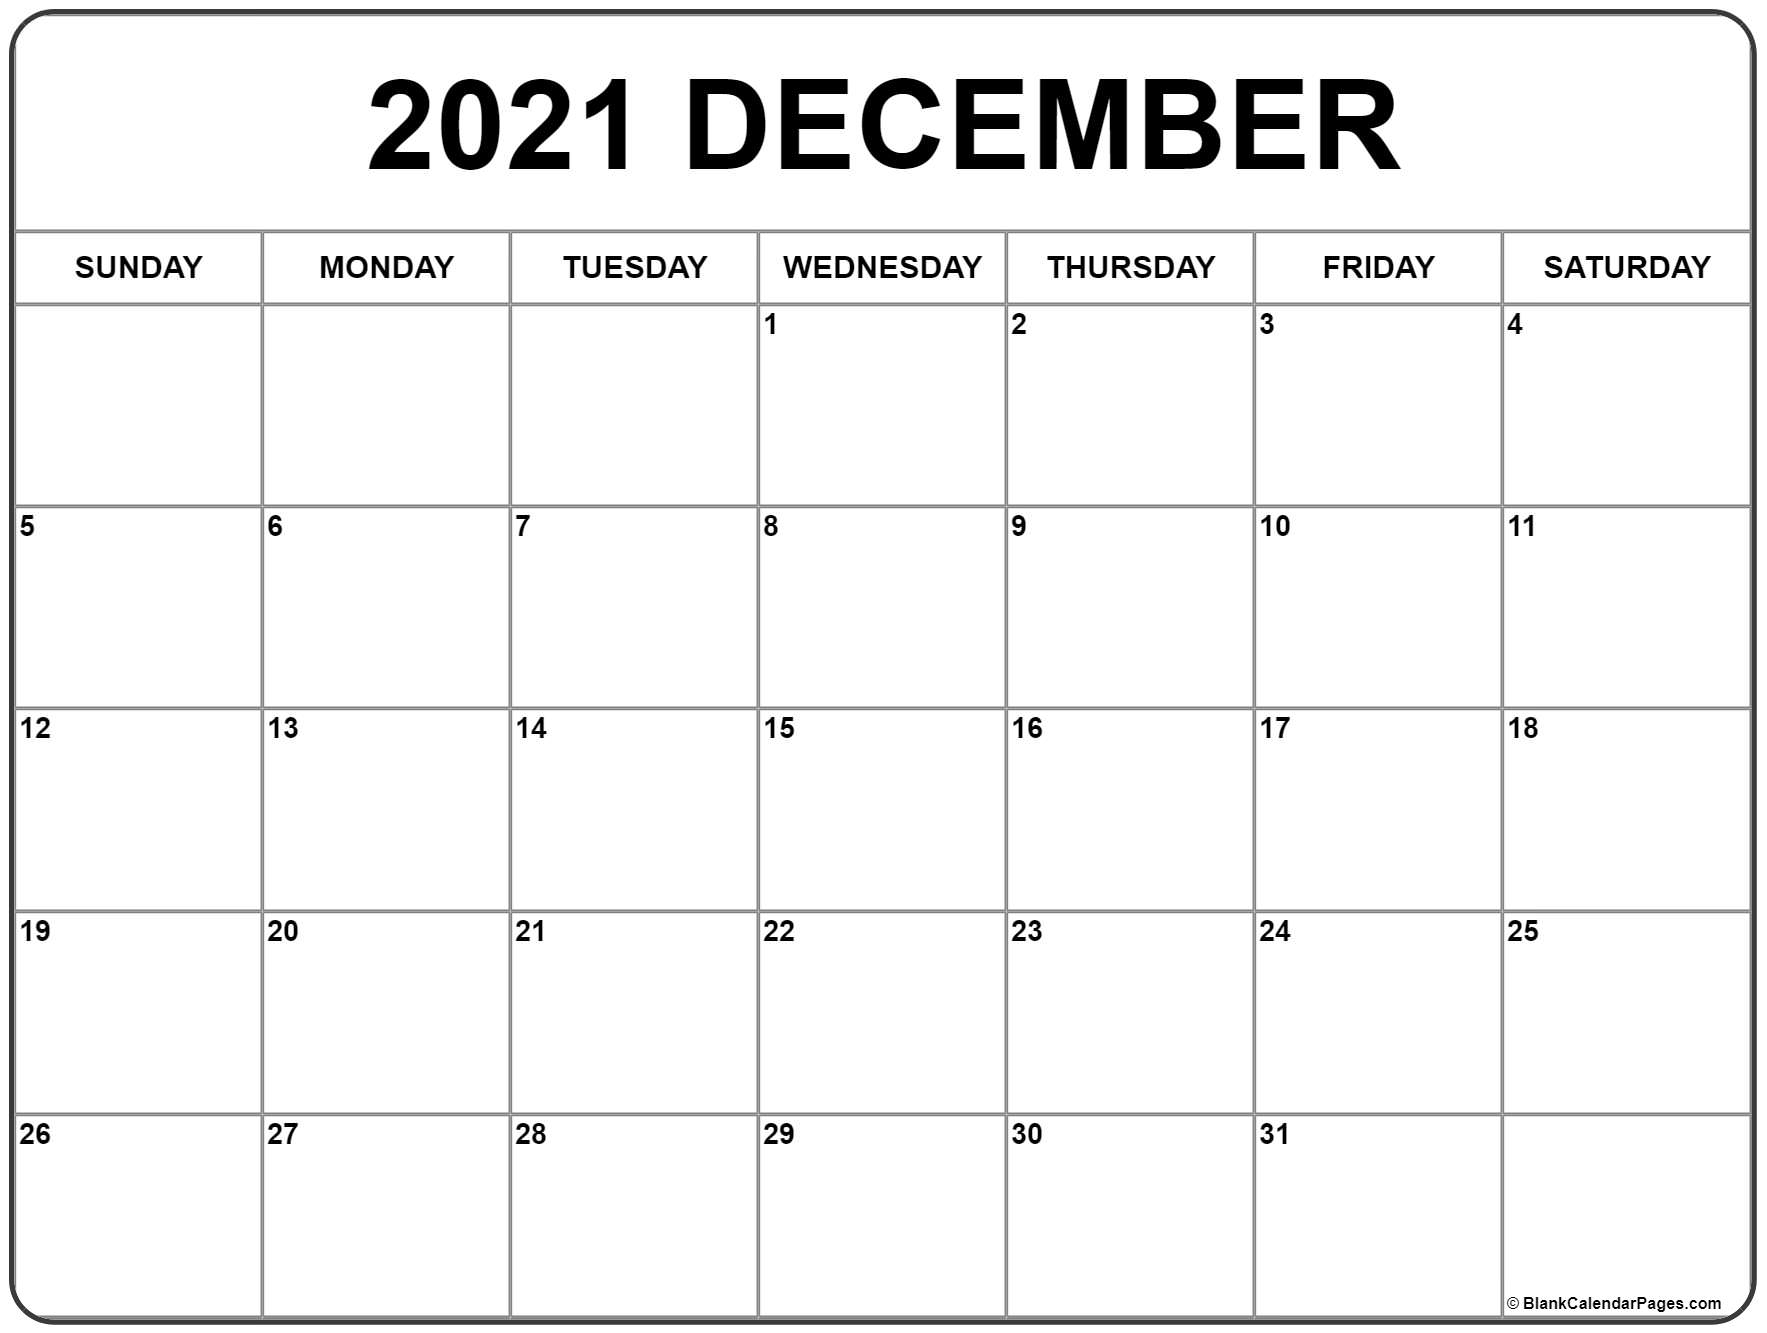 Pick Decembers Calender For 2021